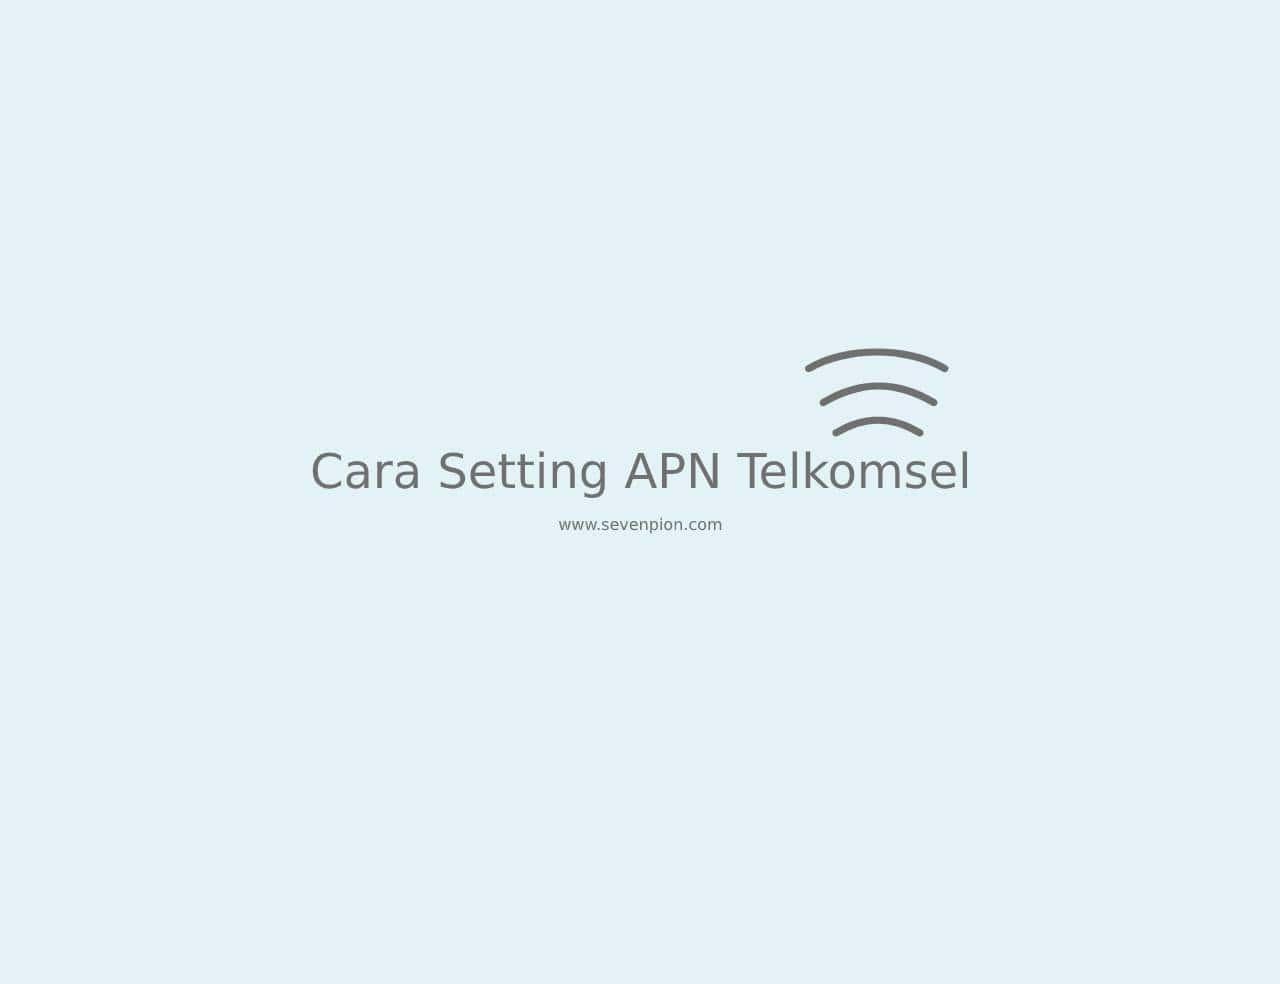 setting apn telkomsel tercepat